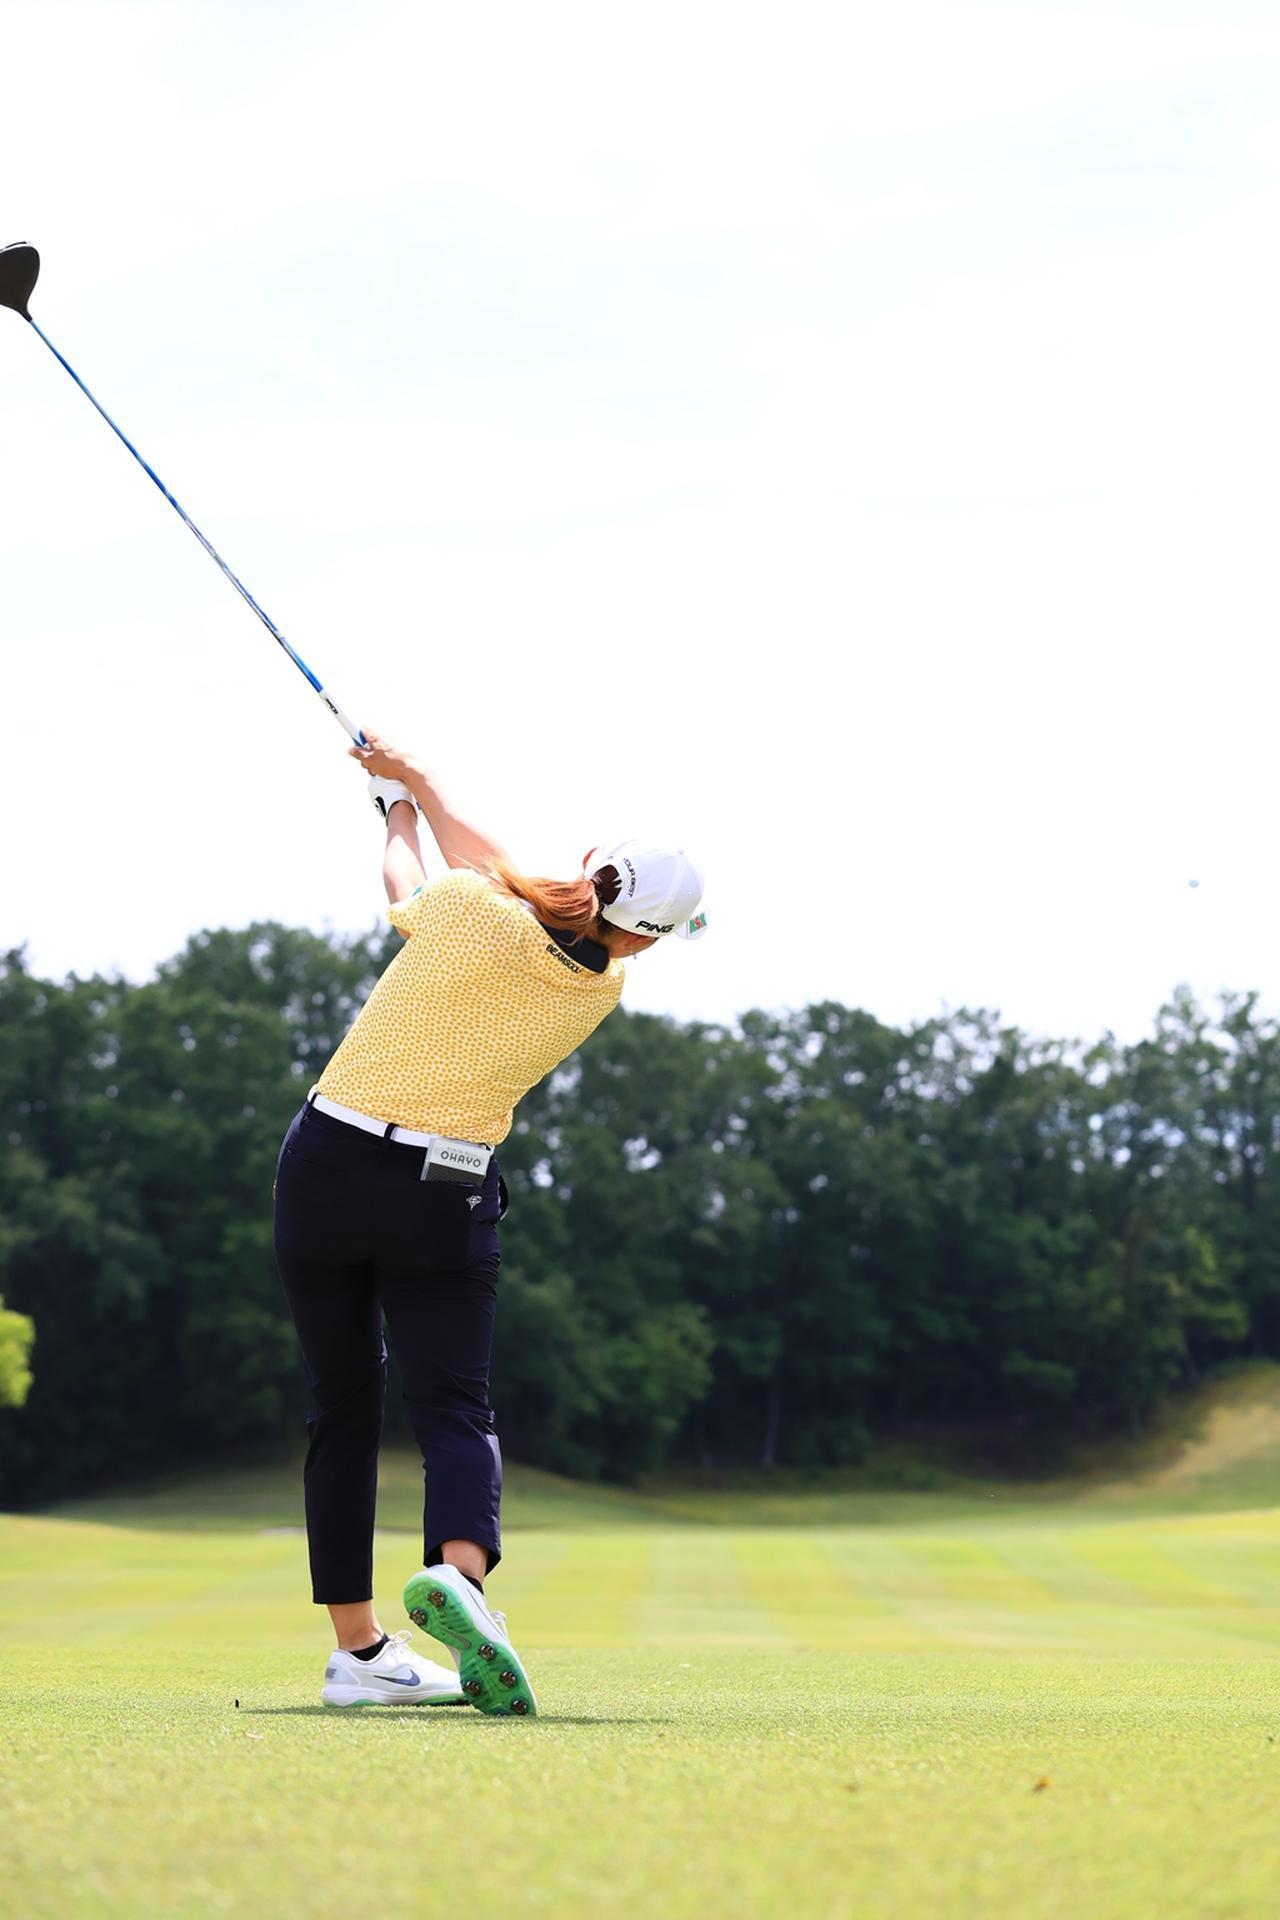 Images : 16番目の画像 - 渋野日向子のドライバー後方連続写真 - みんなのゴルフダイジェスト